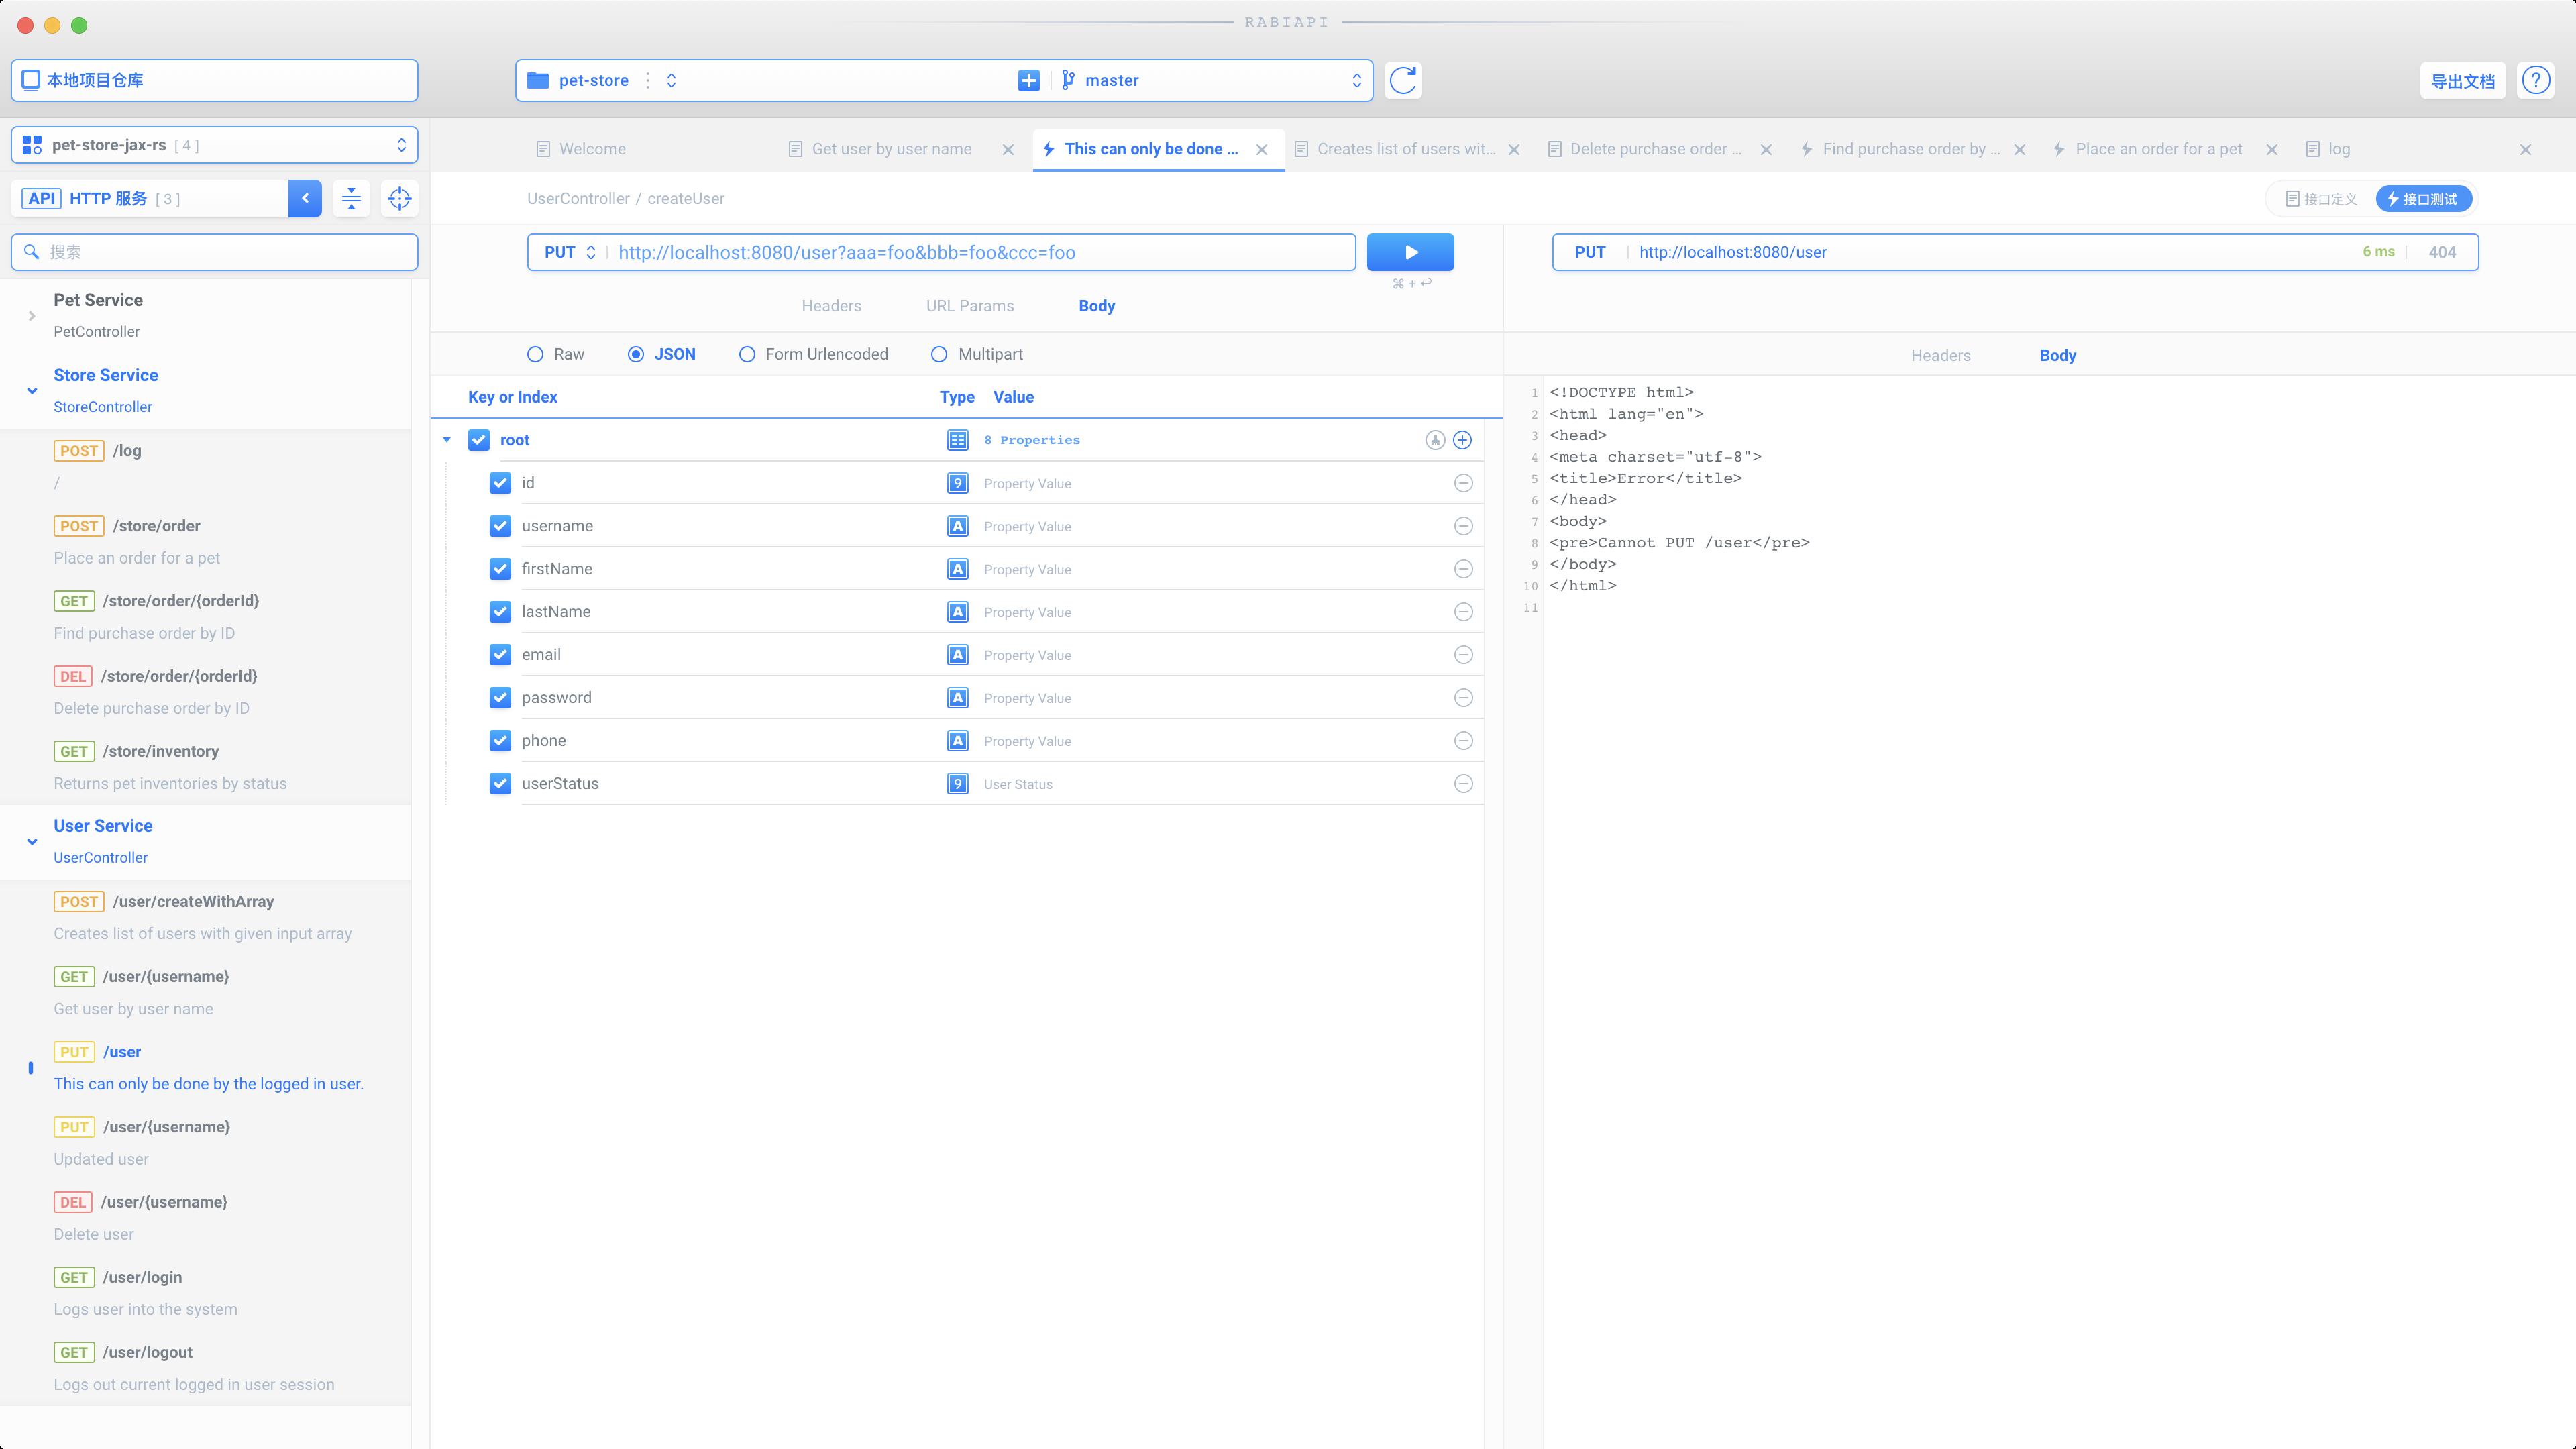 Screenshot - 2021-01-21 20.13.24.png